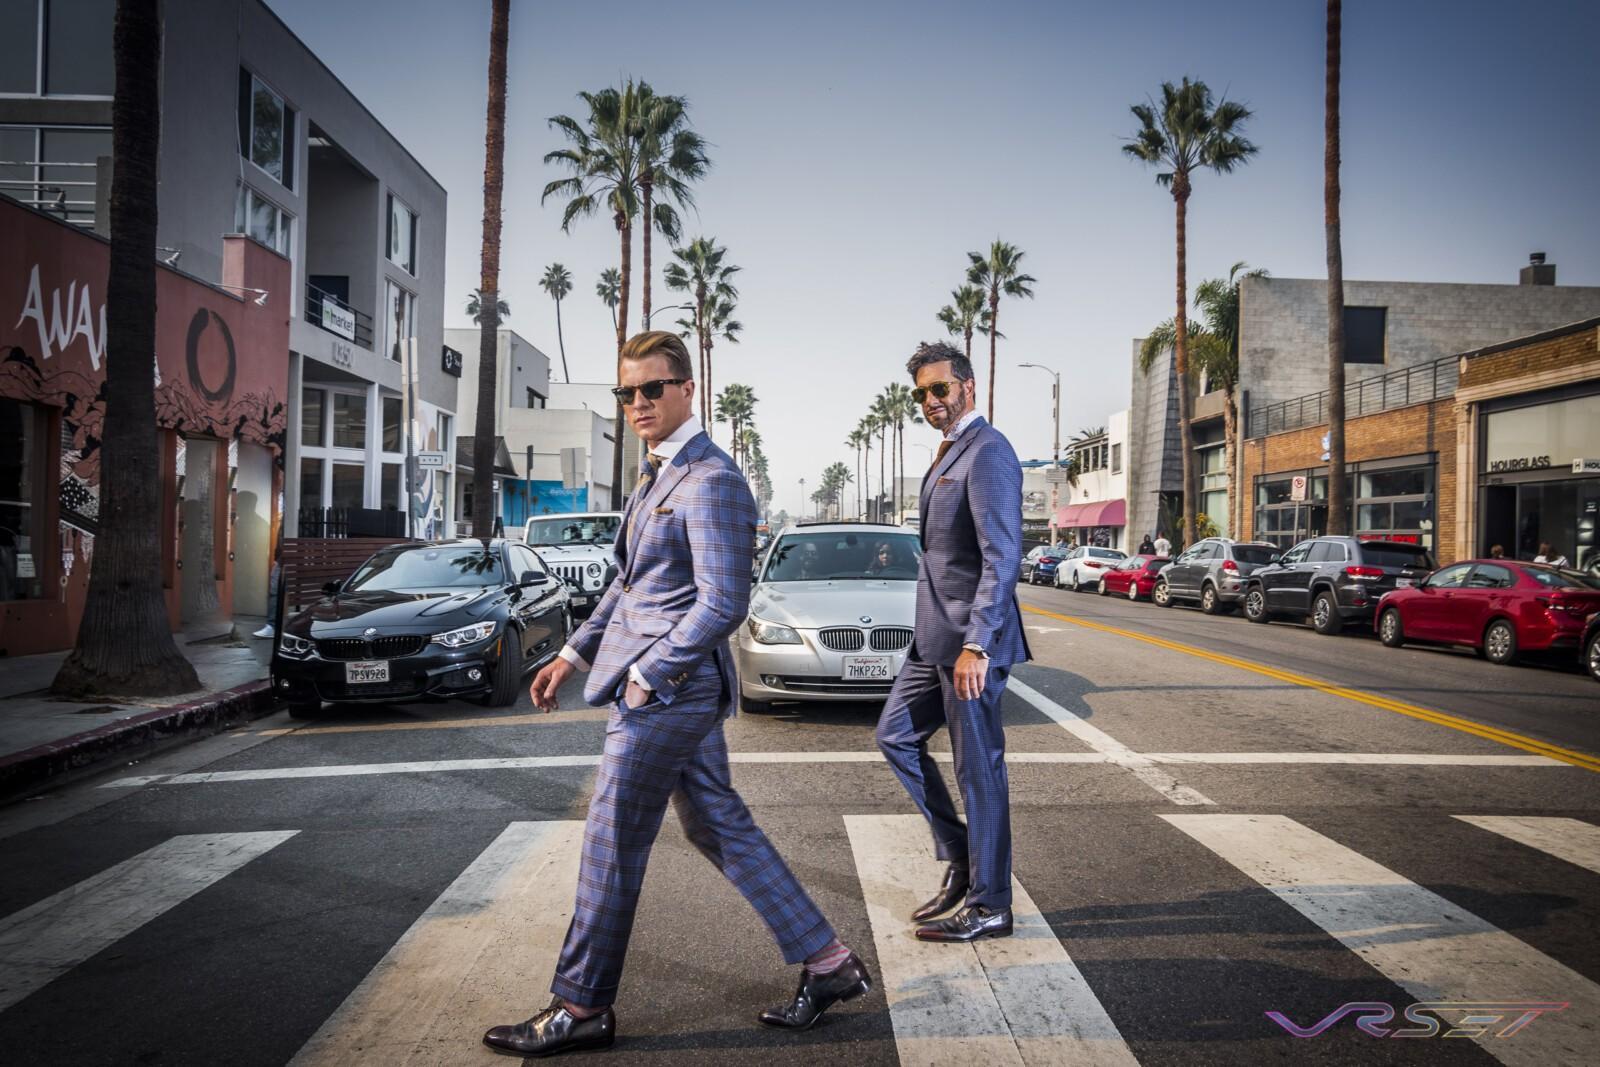 Designer Daniel George Men's Bespoke Custom Suits Lifestyle Top Fashion Photographer Los Angeles Orange County Video Production David Victory